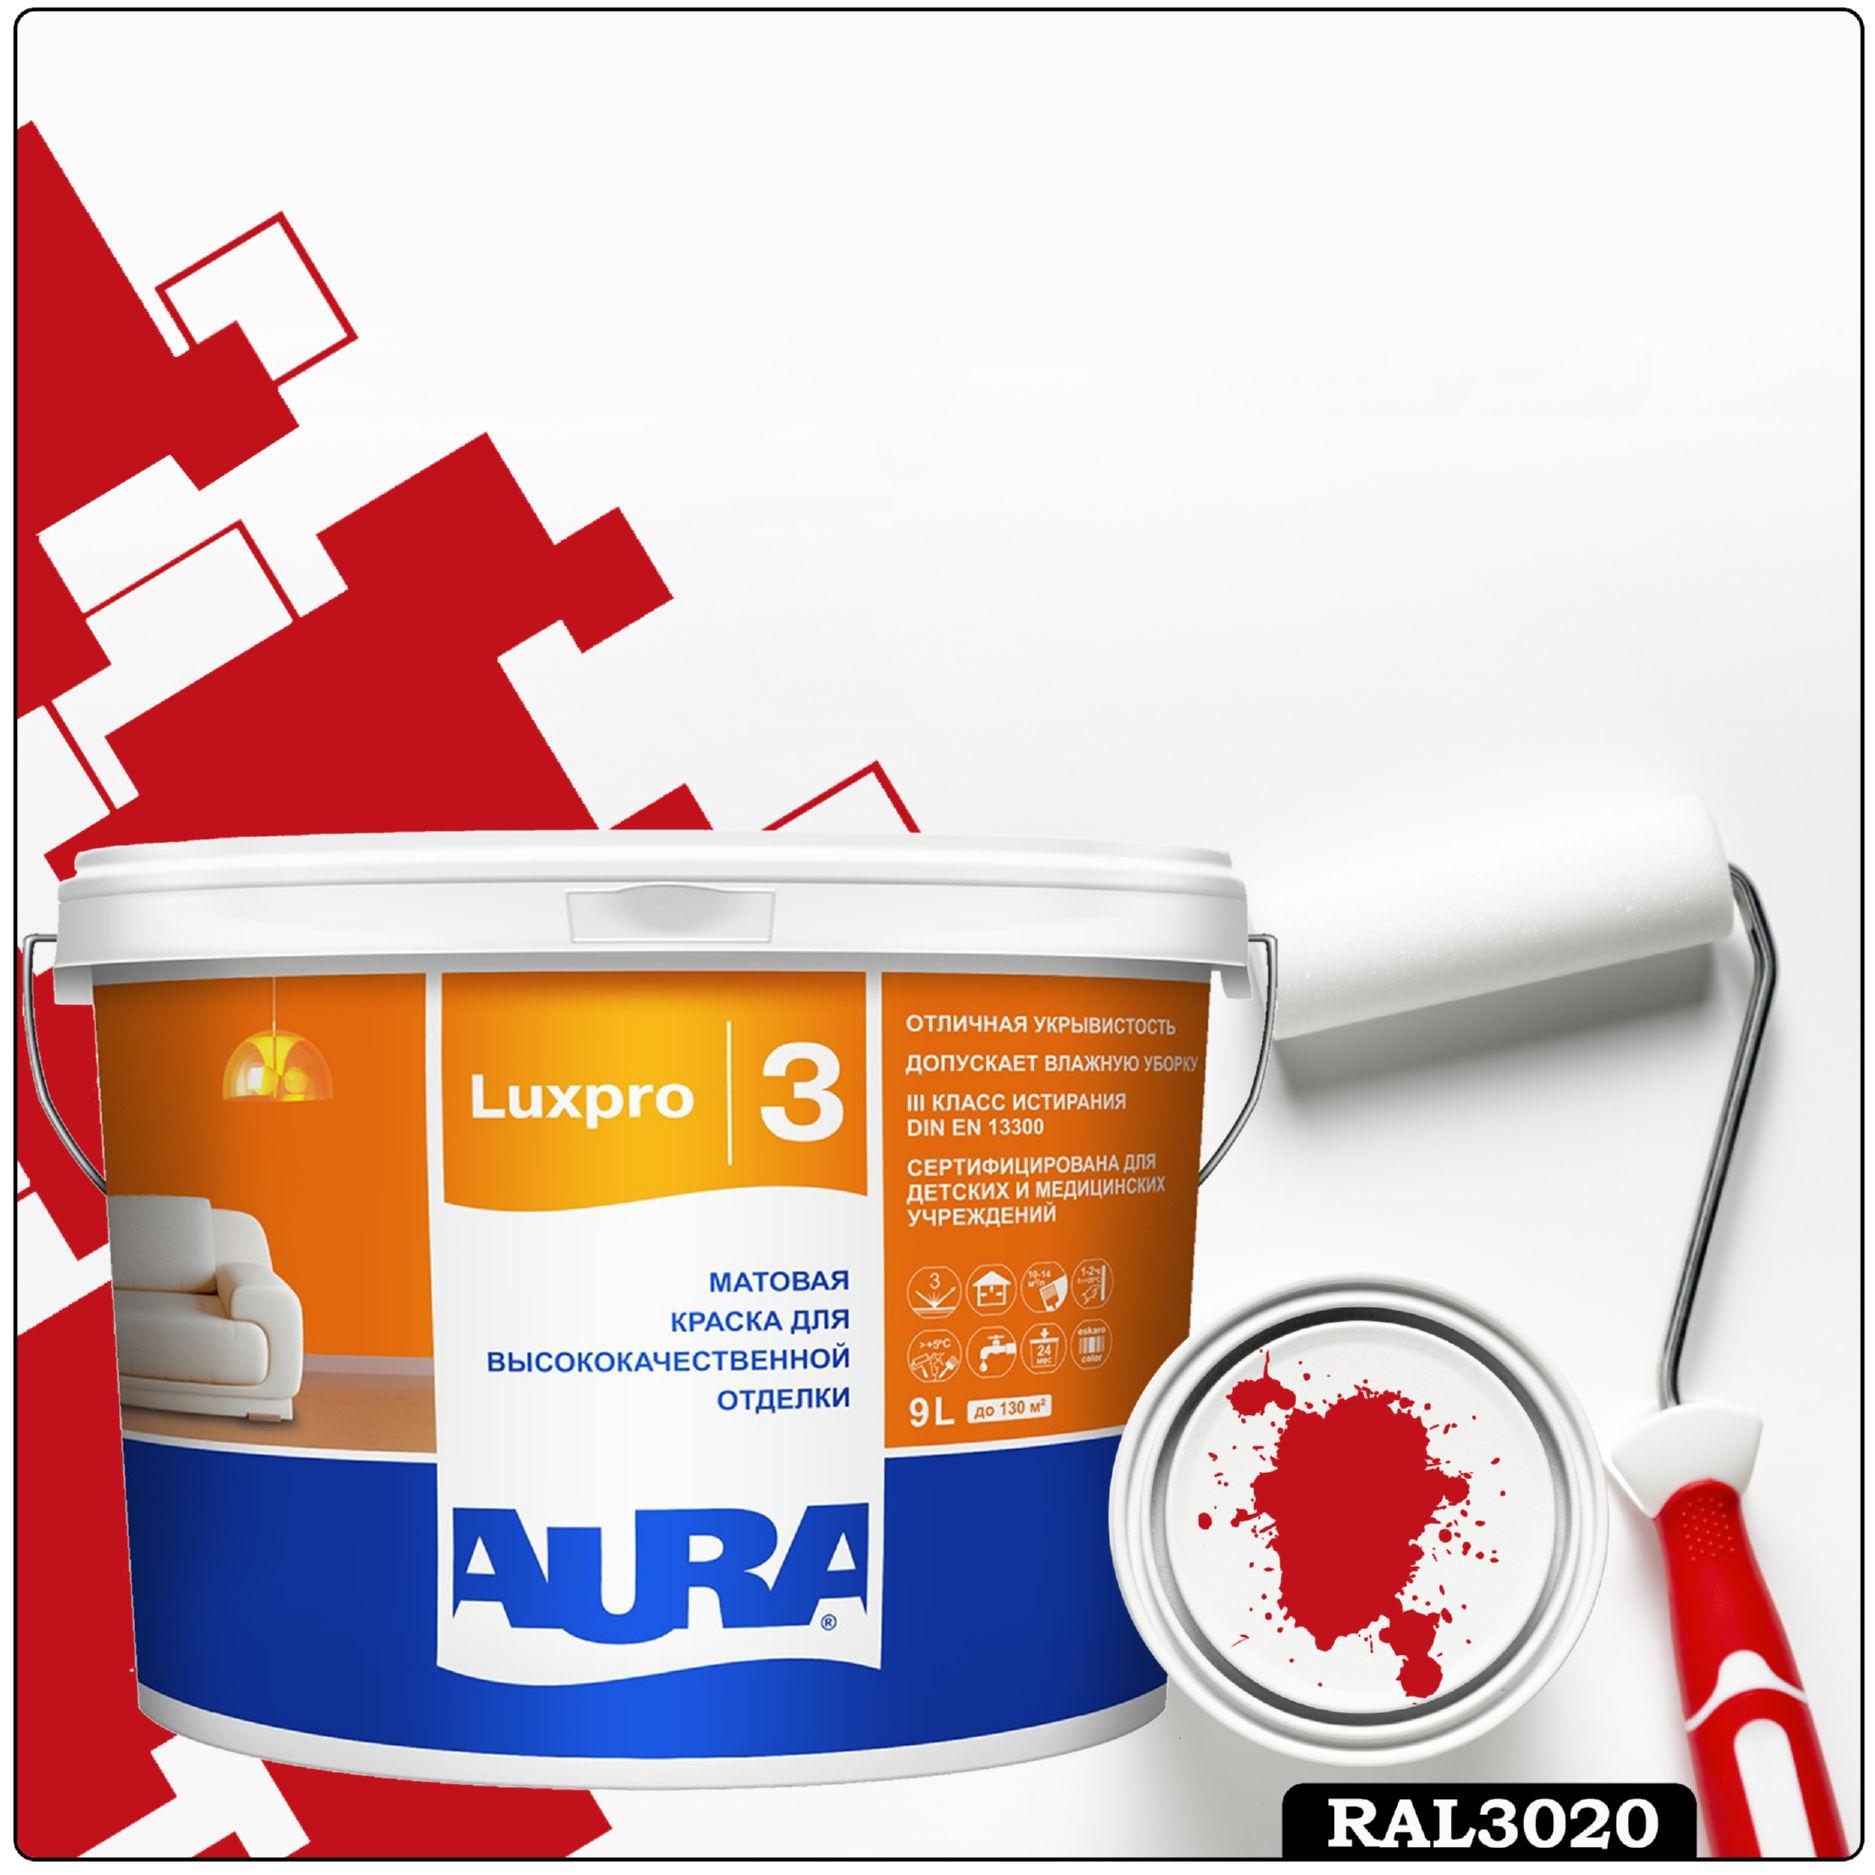 Фото 17 - Краска Aura LuxPRO 3, RAL 3020 Транспортный красный, латексная, шелково-матовая, интерьерная, 9л, Аура.